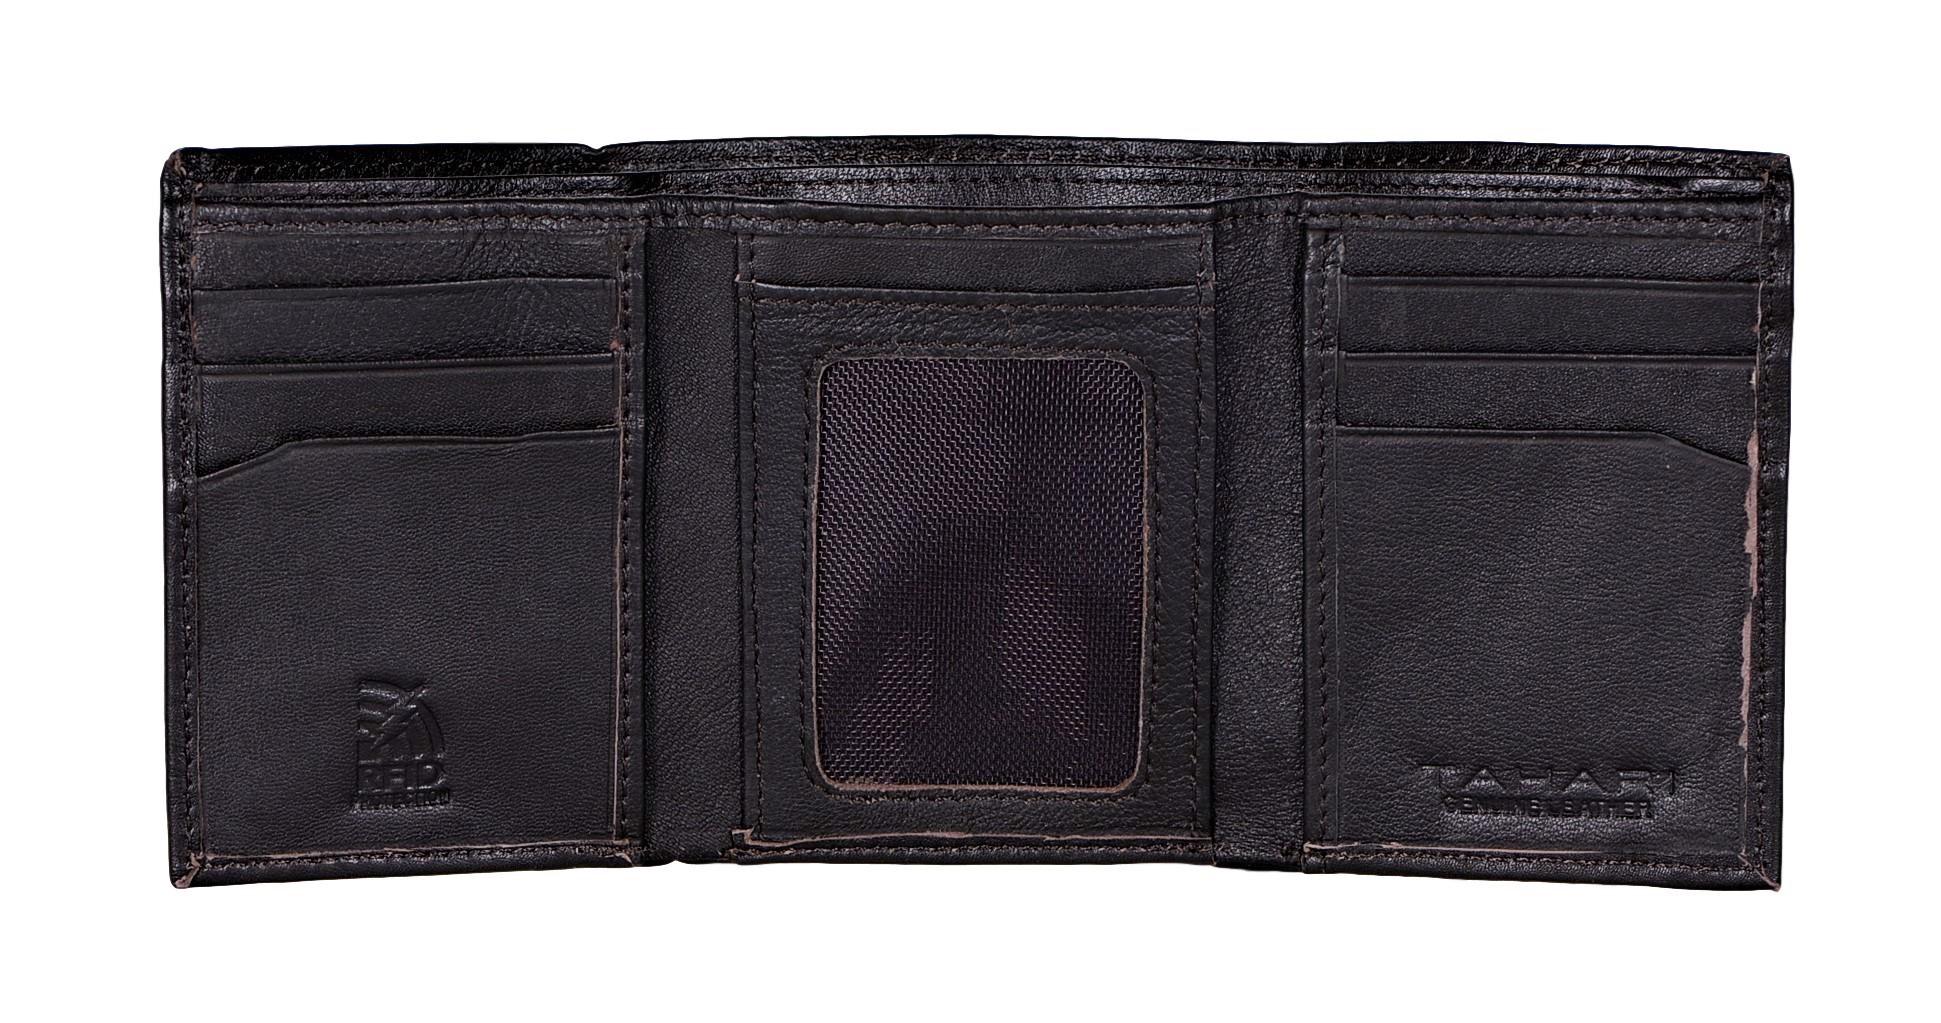 Tahari-Men-039-s-RFID-Security-Blocking-Leather-Glove-Trifold-Wallet thumbnail 13